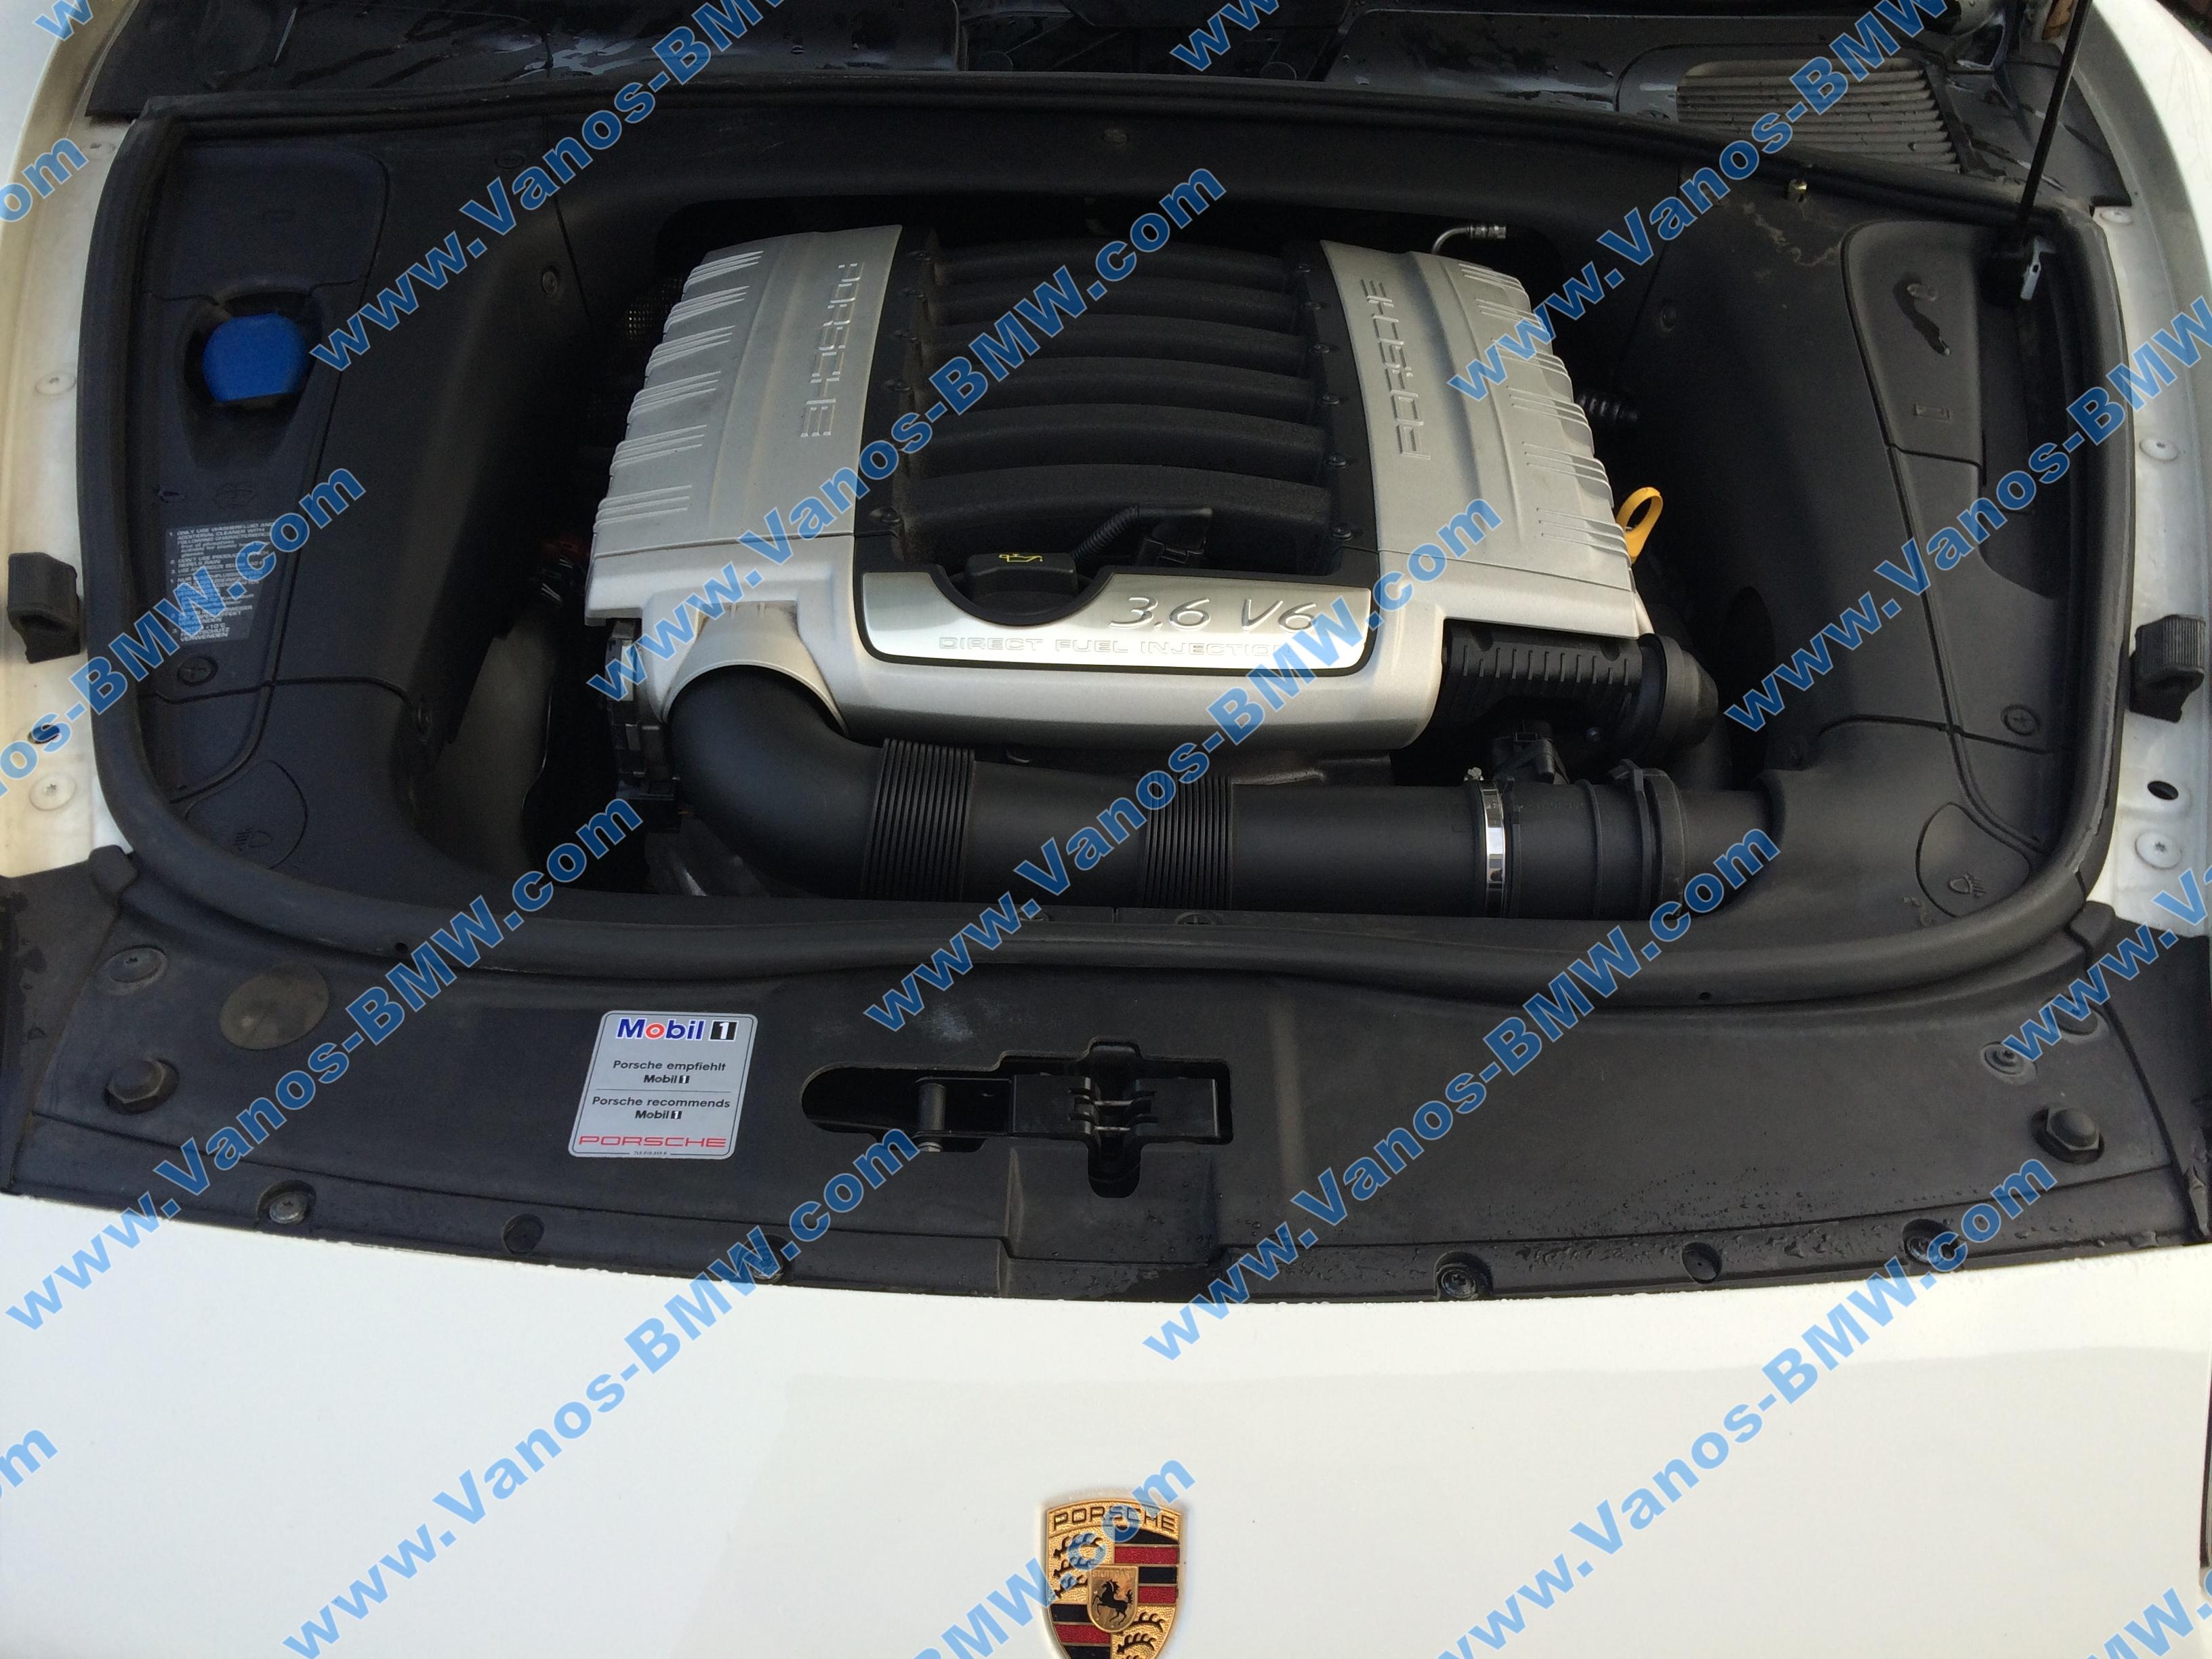 Diaphragm Valve For Crankcase Ventilation Porsche Cayenne 36 M5501 Engine Diagram 95510513501 95510513500 95810513530